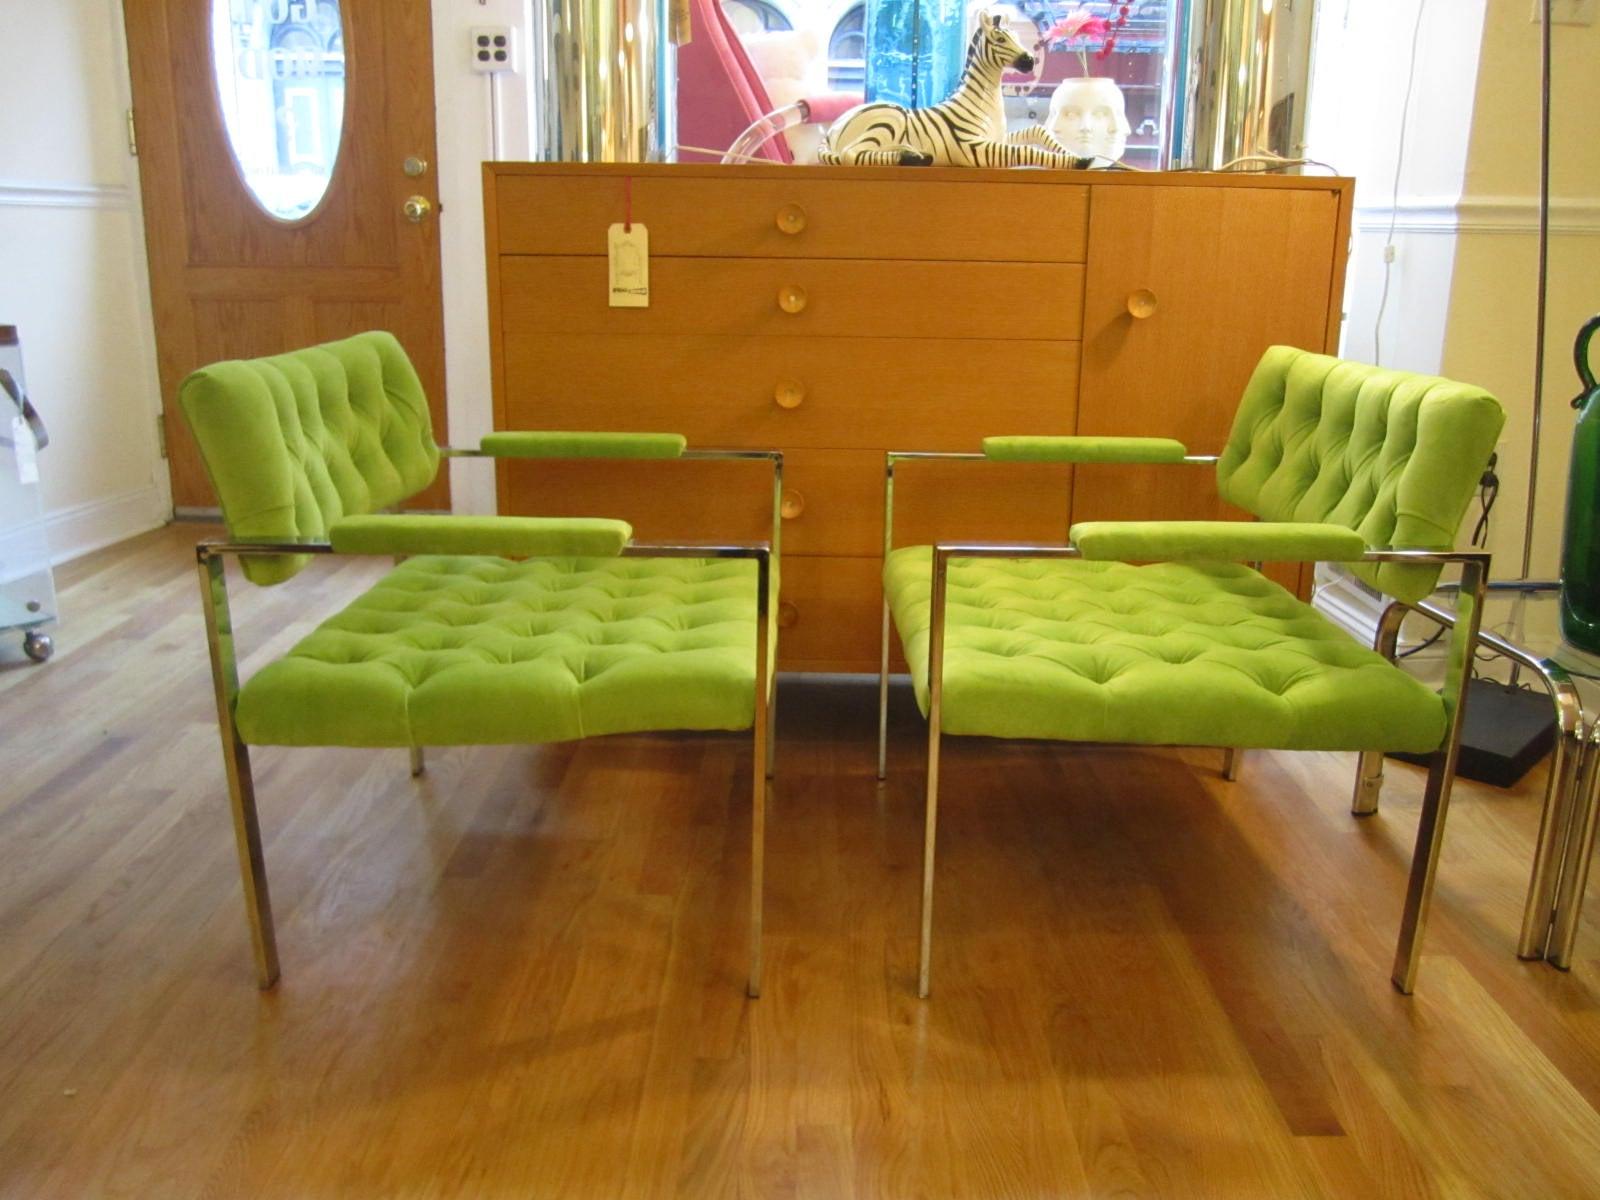 Stunning Pair Mid-Century Modern Tufted Chrome Flat Bar Lounge Chairs